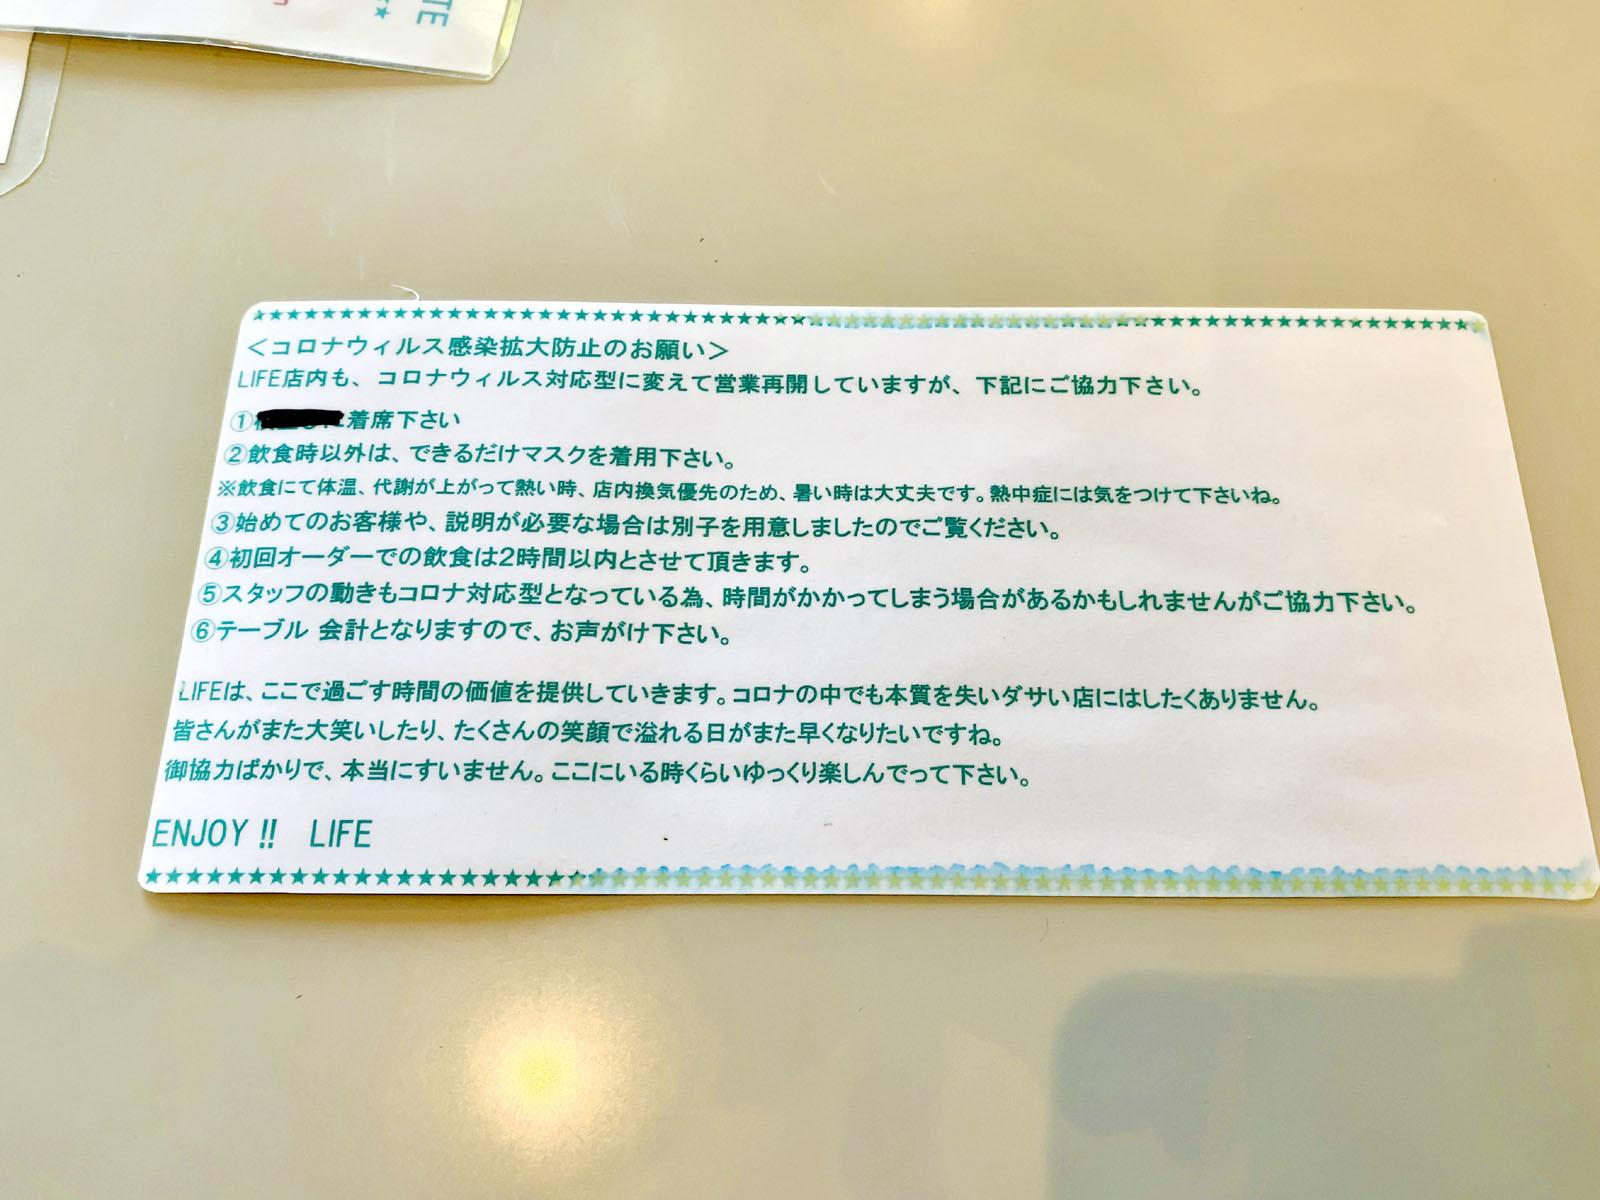 LIFE cafe 感染拡大防止のお願い